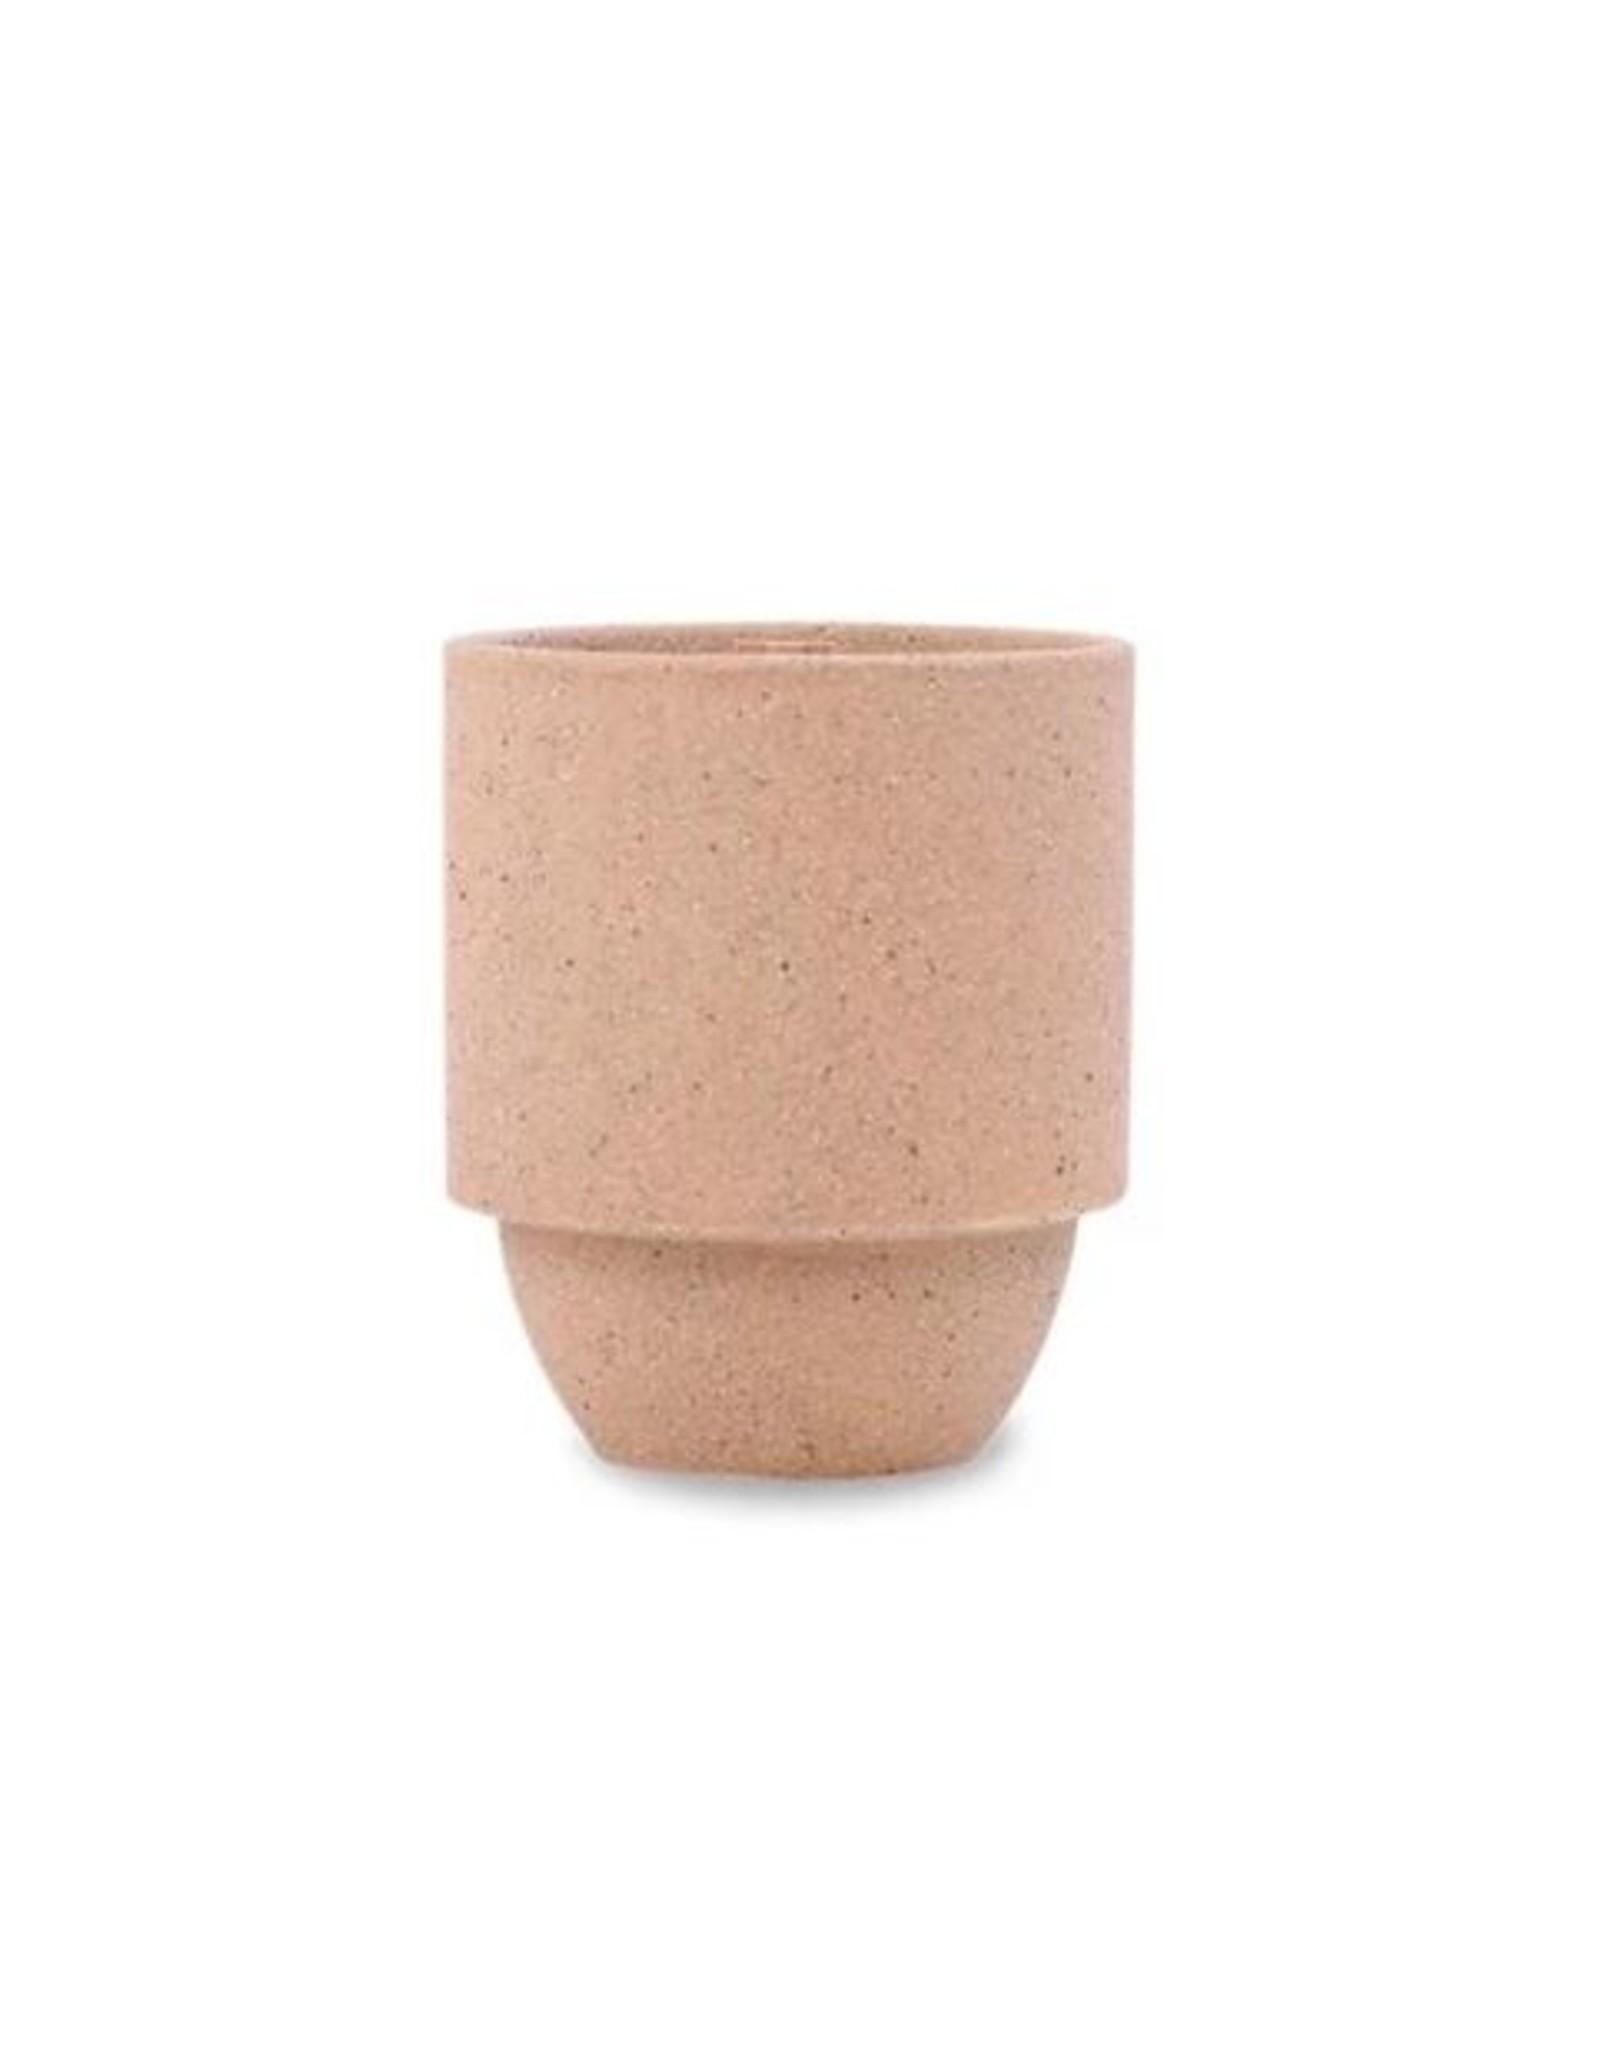 Sagebrush + Fir Candle 11 oz